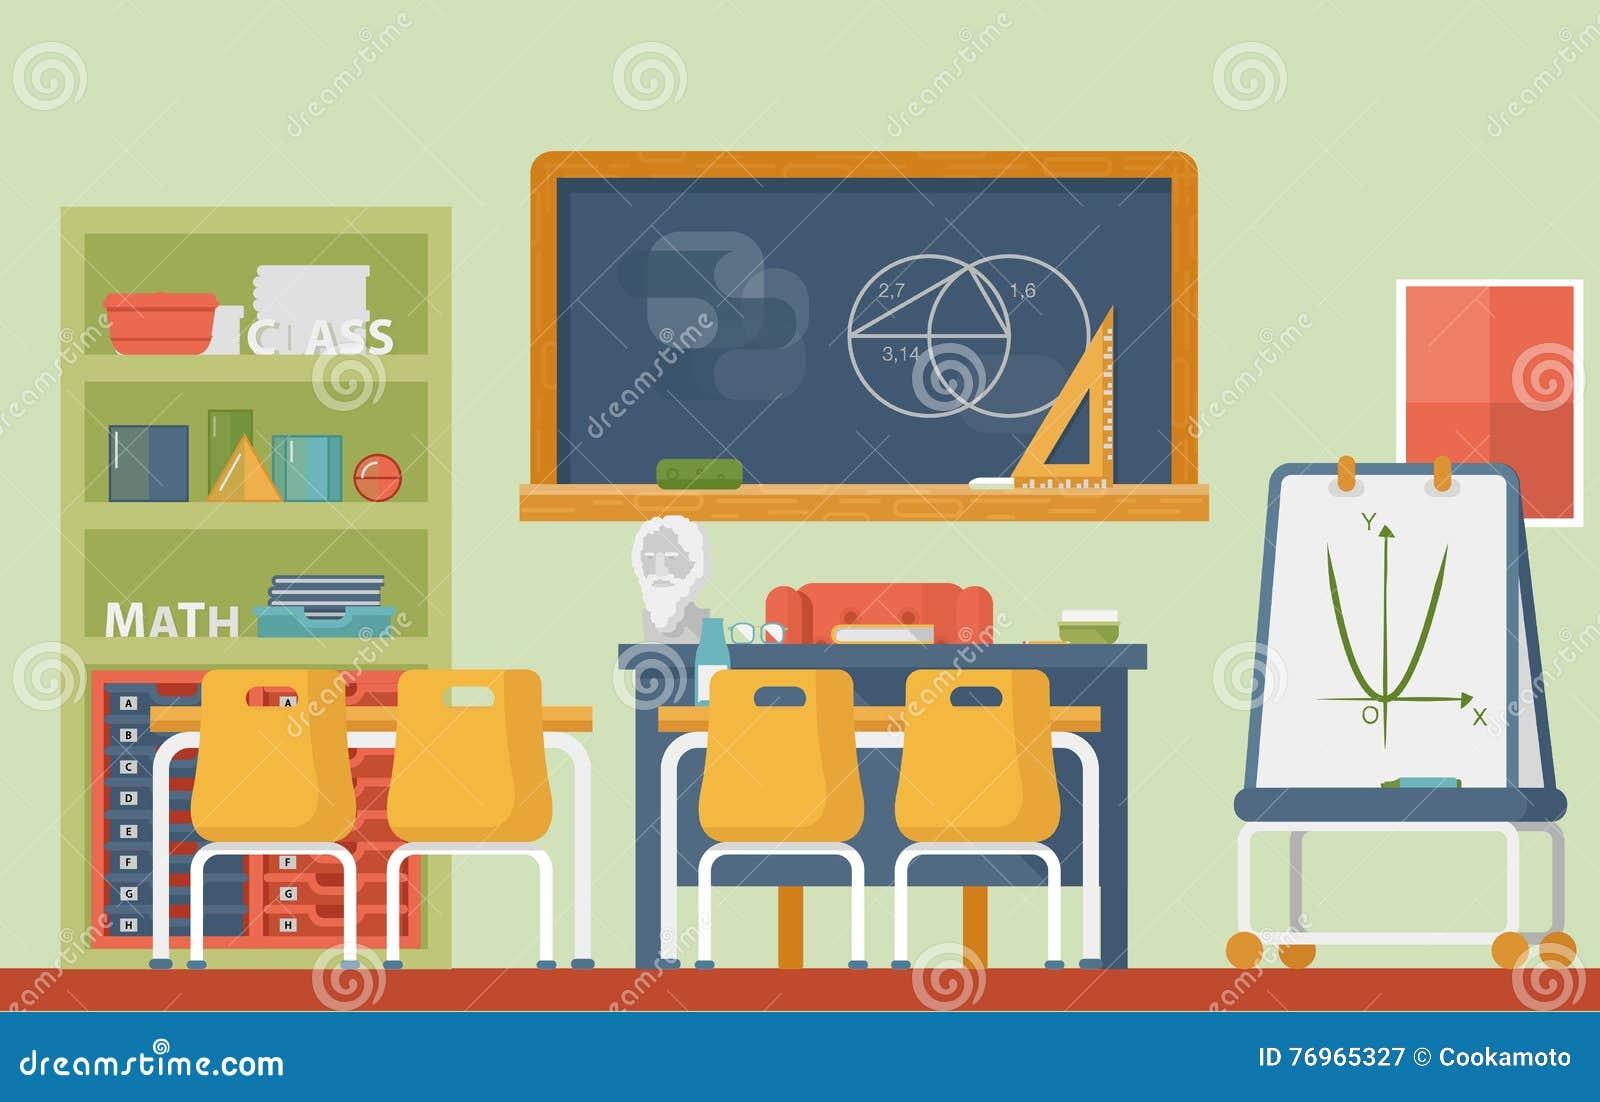 Mathematic, Geometry School Classroom Interior  Lesson Of